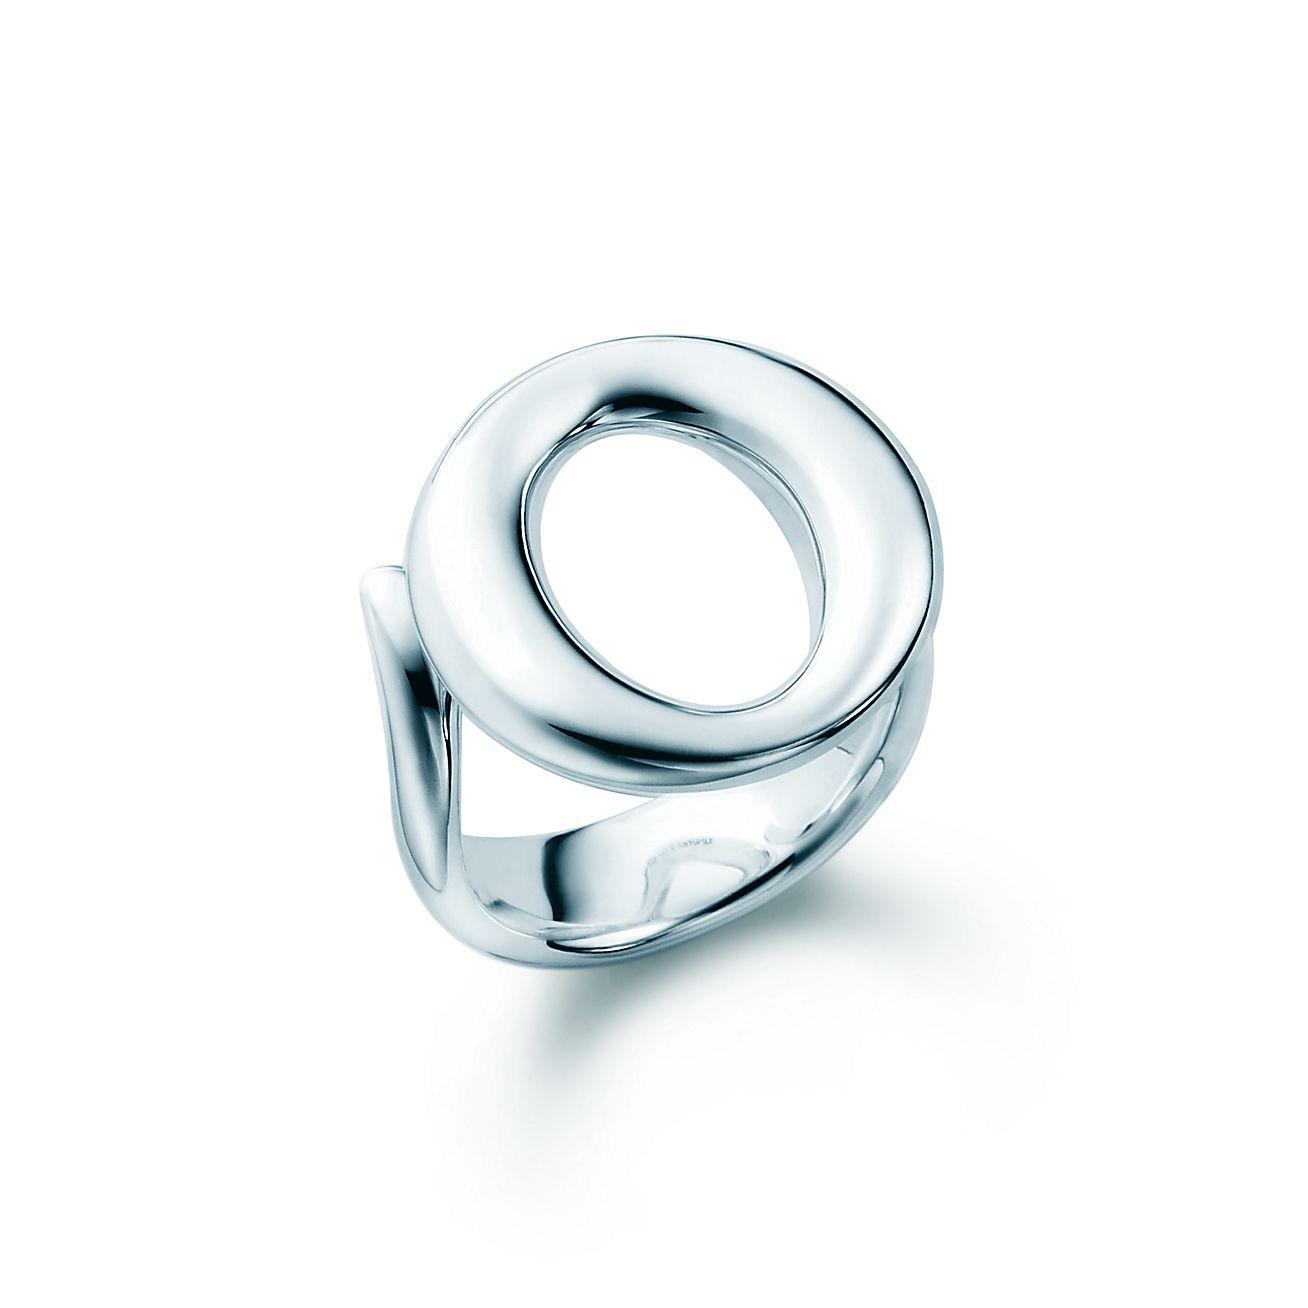 elsa peretti sevillana ring in sterling silver small tiffany co. Black Bedroom Furniture Sets. Home Design Ideas